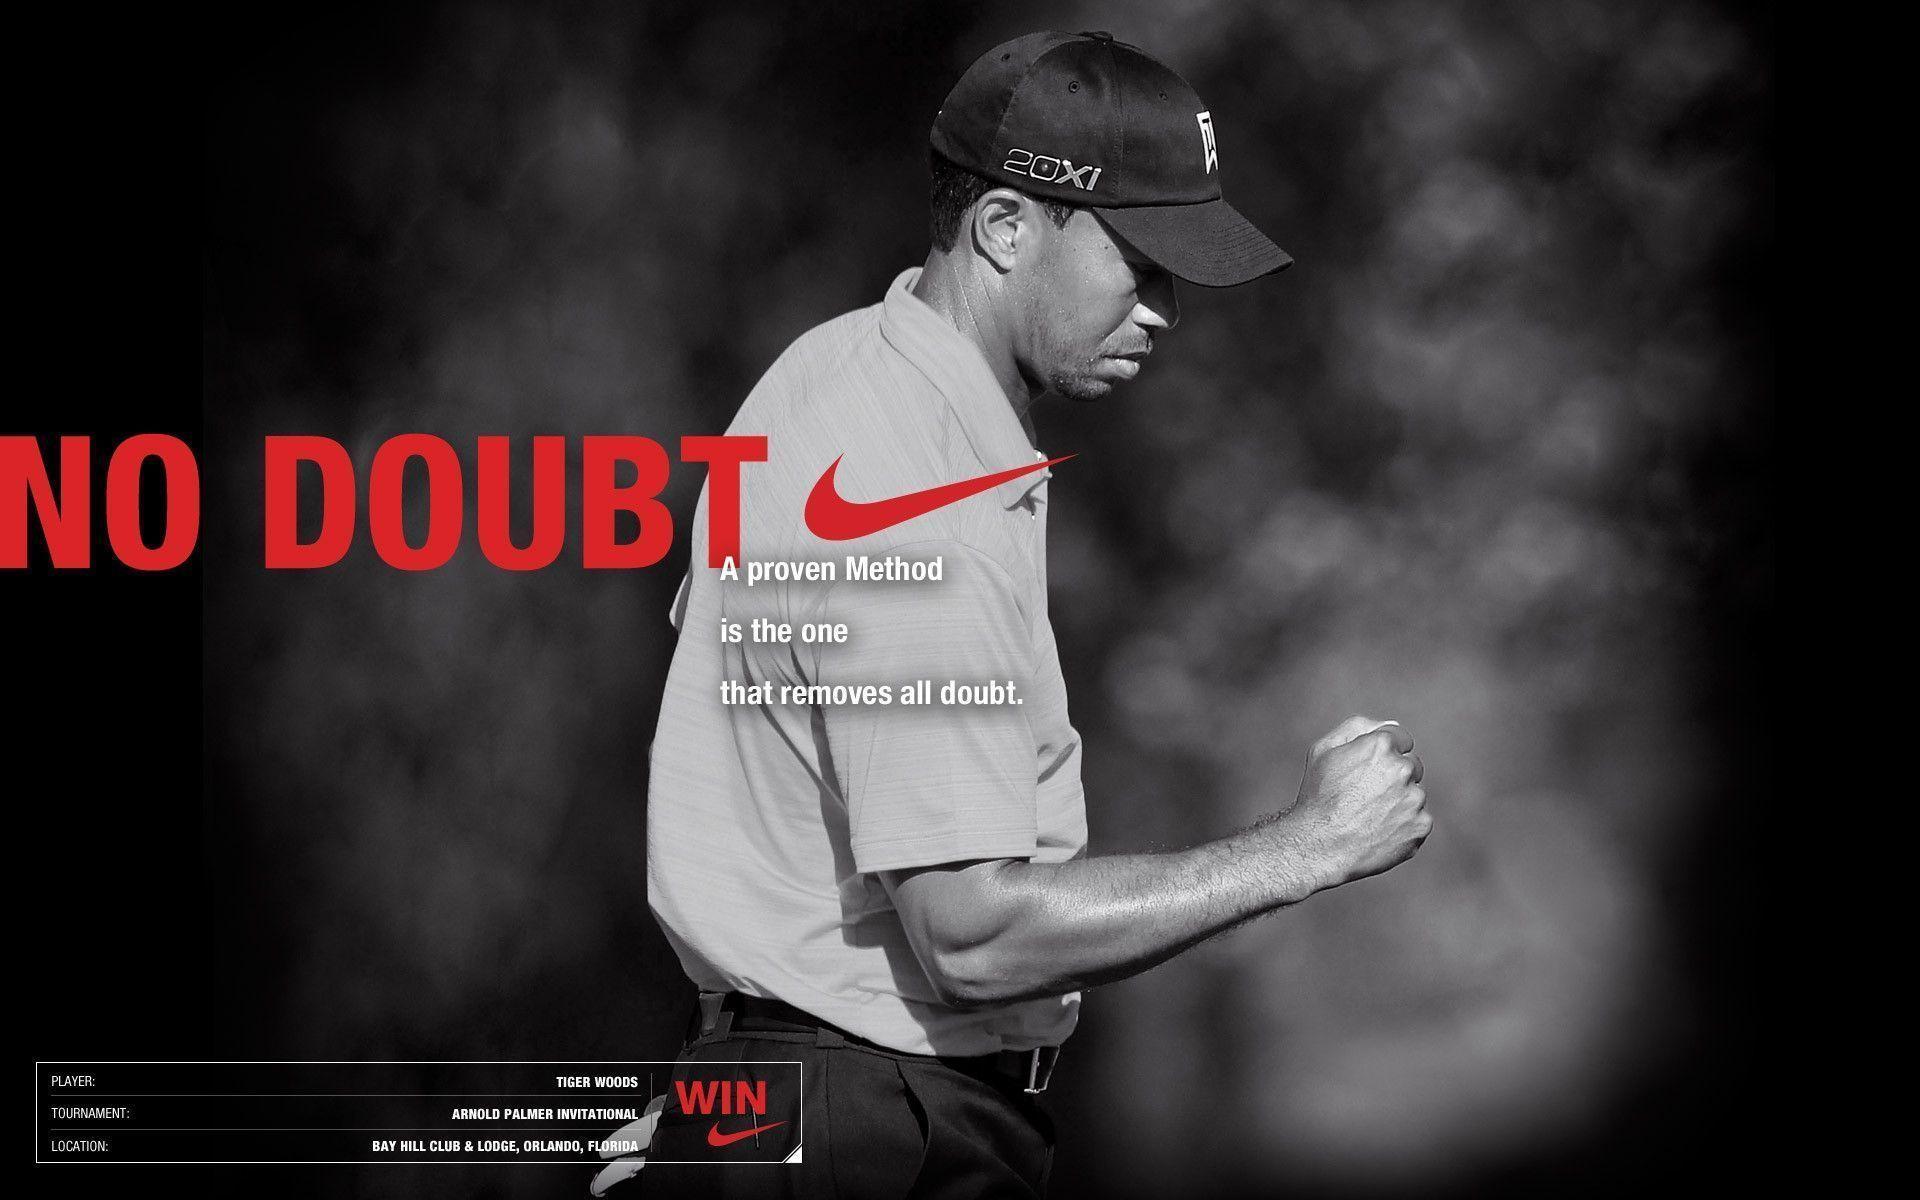 Nike golf wallpapers wallpaper cave - Tiger woods desktop wallpaper ...